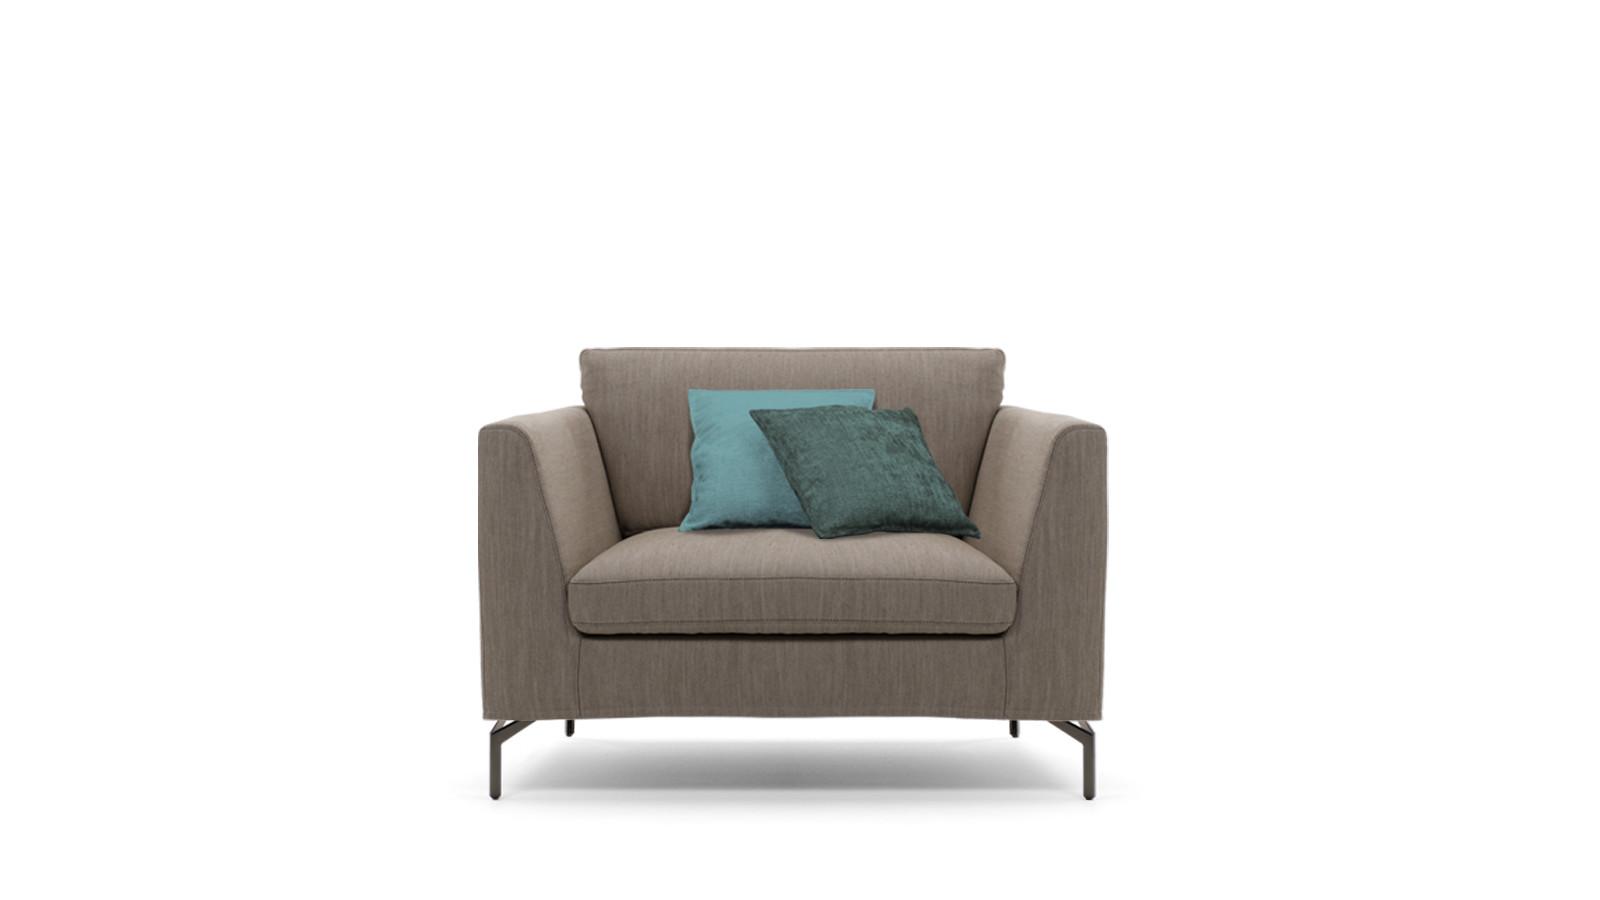 aurorasofa-aria-armchair-00